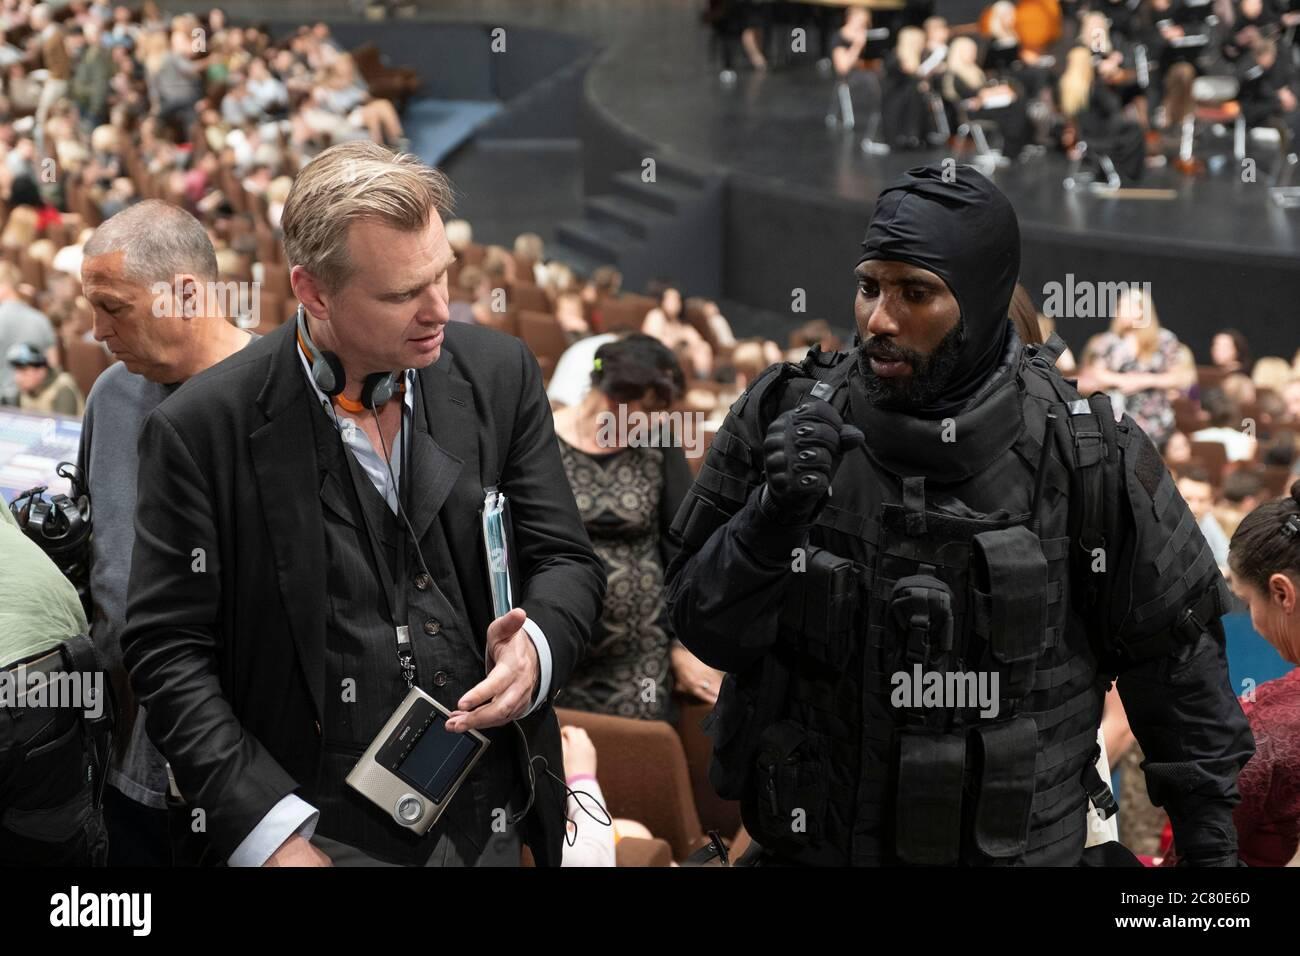 Christopher Nolan And Elizabeth Debicki In Tenet 2020 Directed By Christopher Nolan Credit Warner Bros Pictures Gordon Melinda Sue Album Stock Photo Alamy